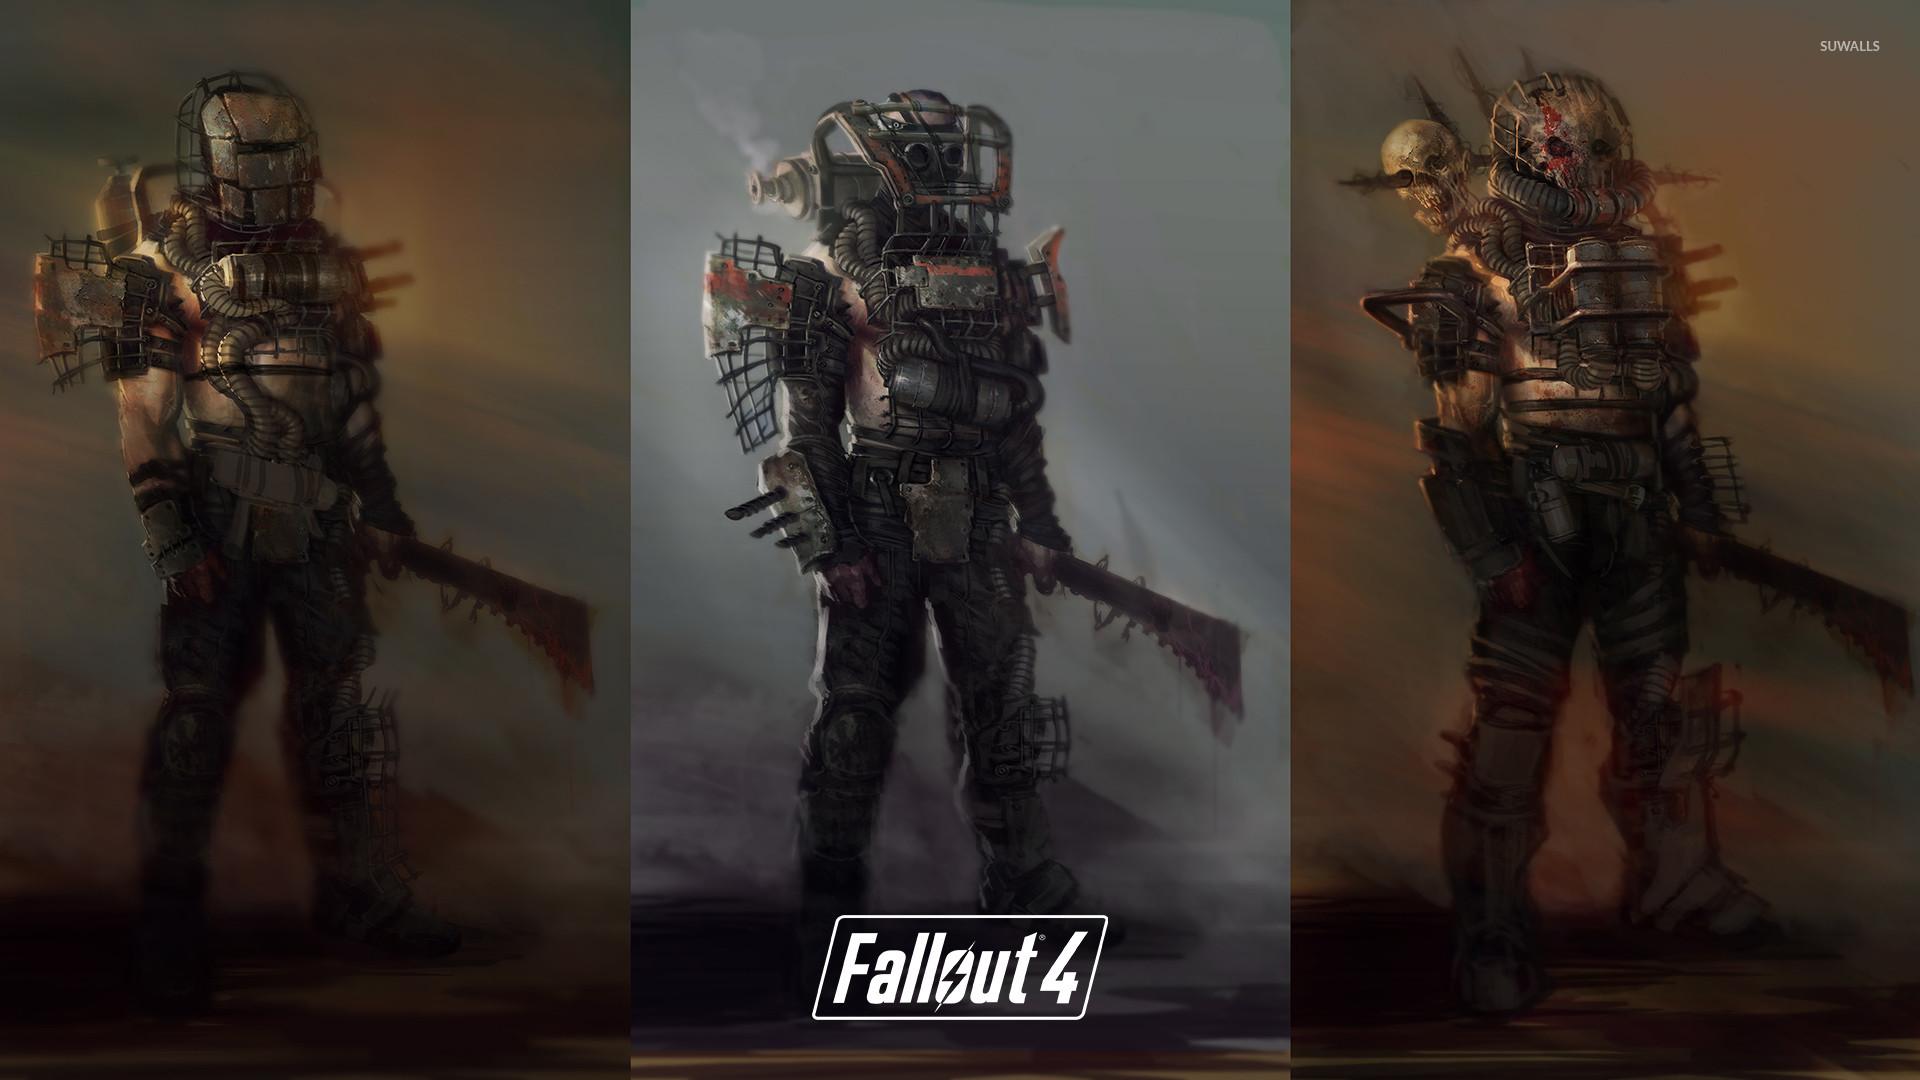 Fallout 4 raiders wallpaper jpg